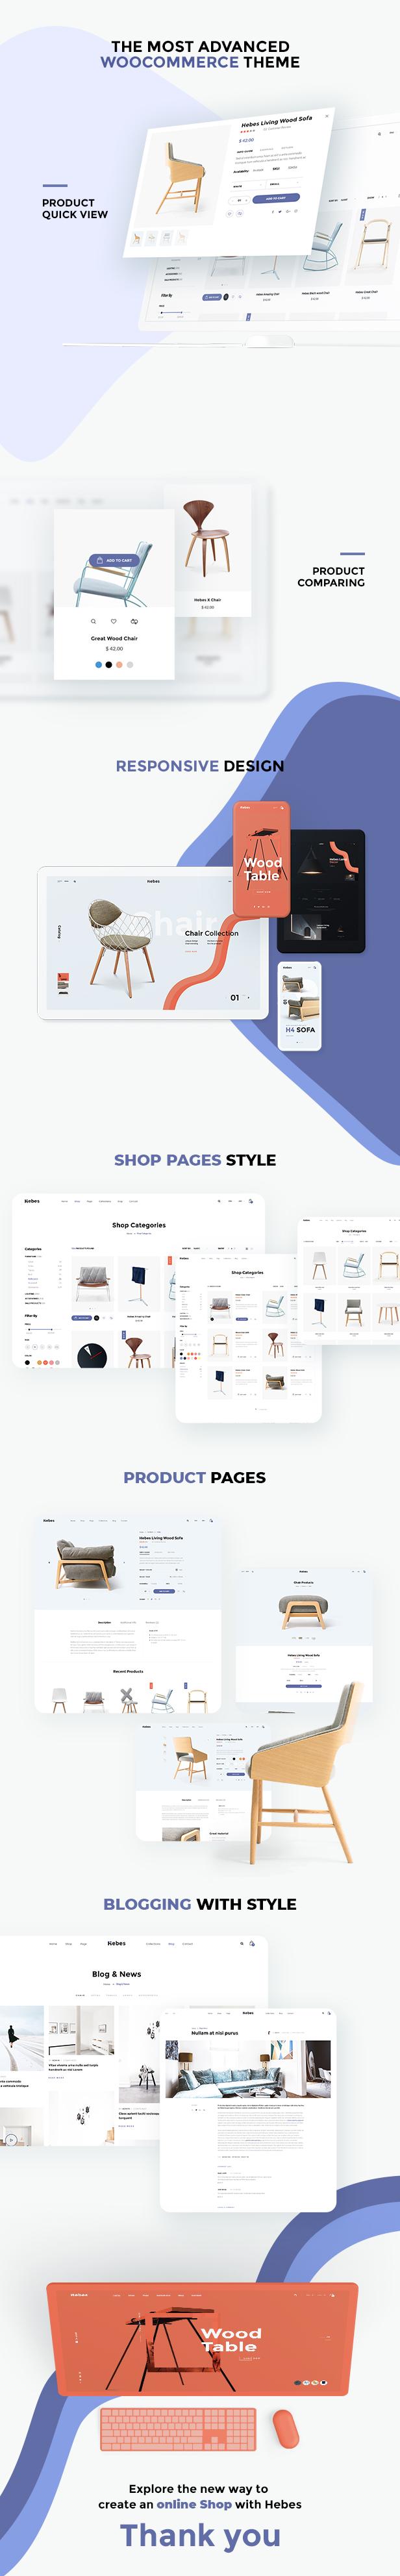 Hebes - Mehrzweck WooCommerce WordPress Theme - 10